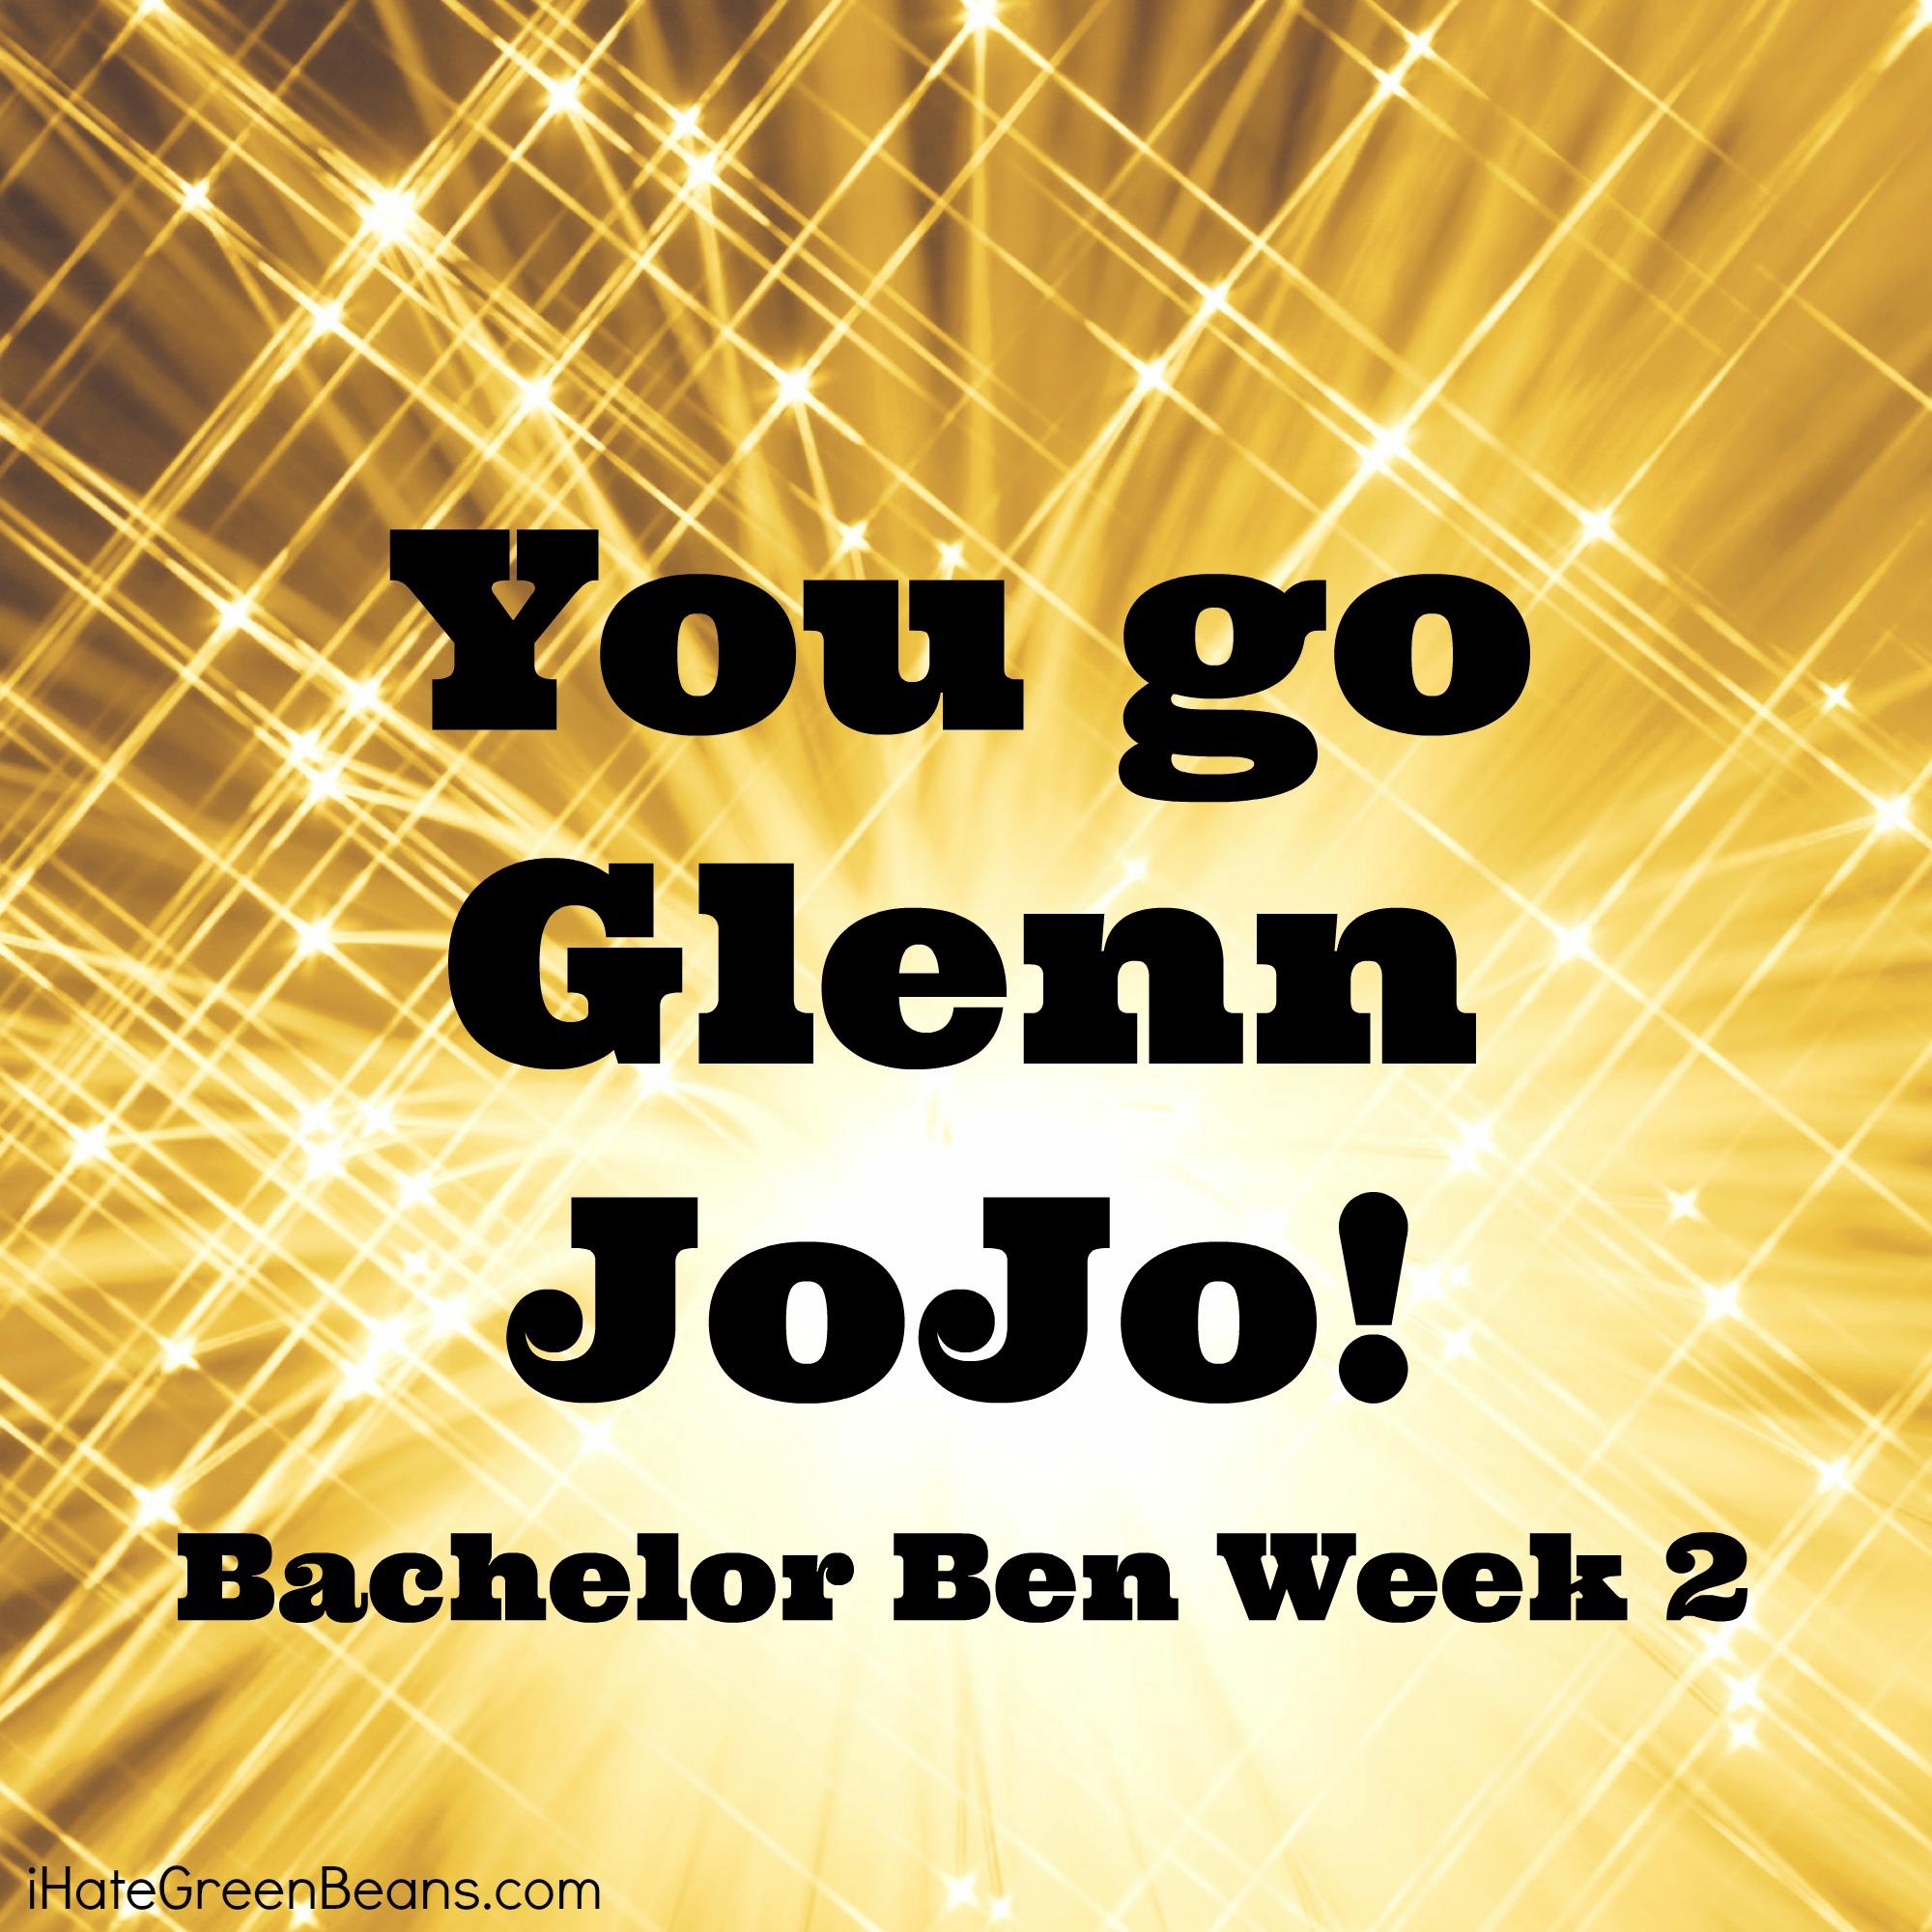 funny bachelor recap-Bachelor Ben Week 2